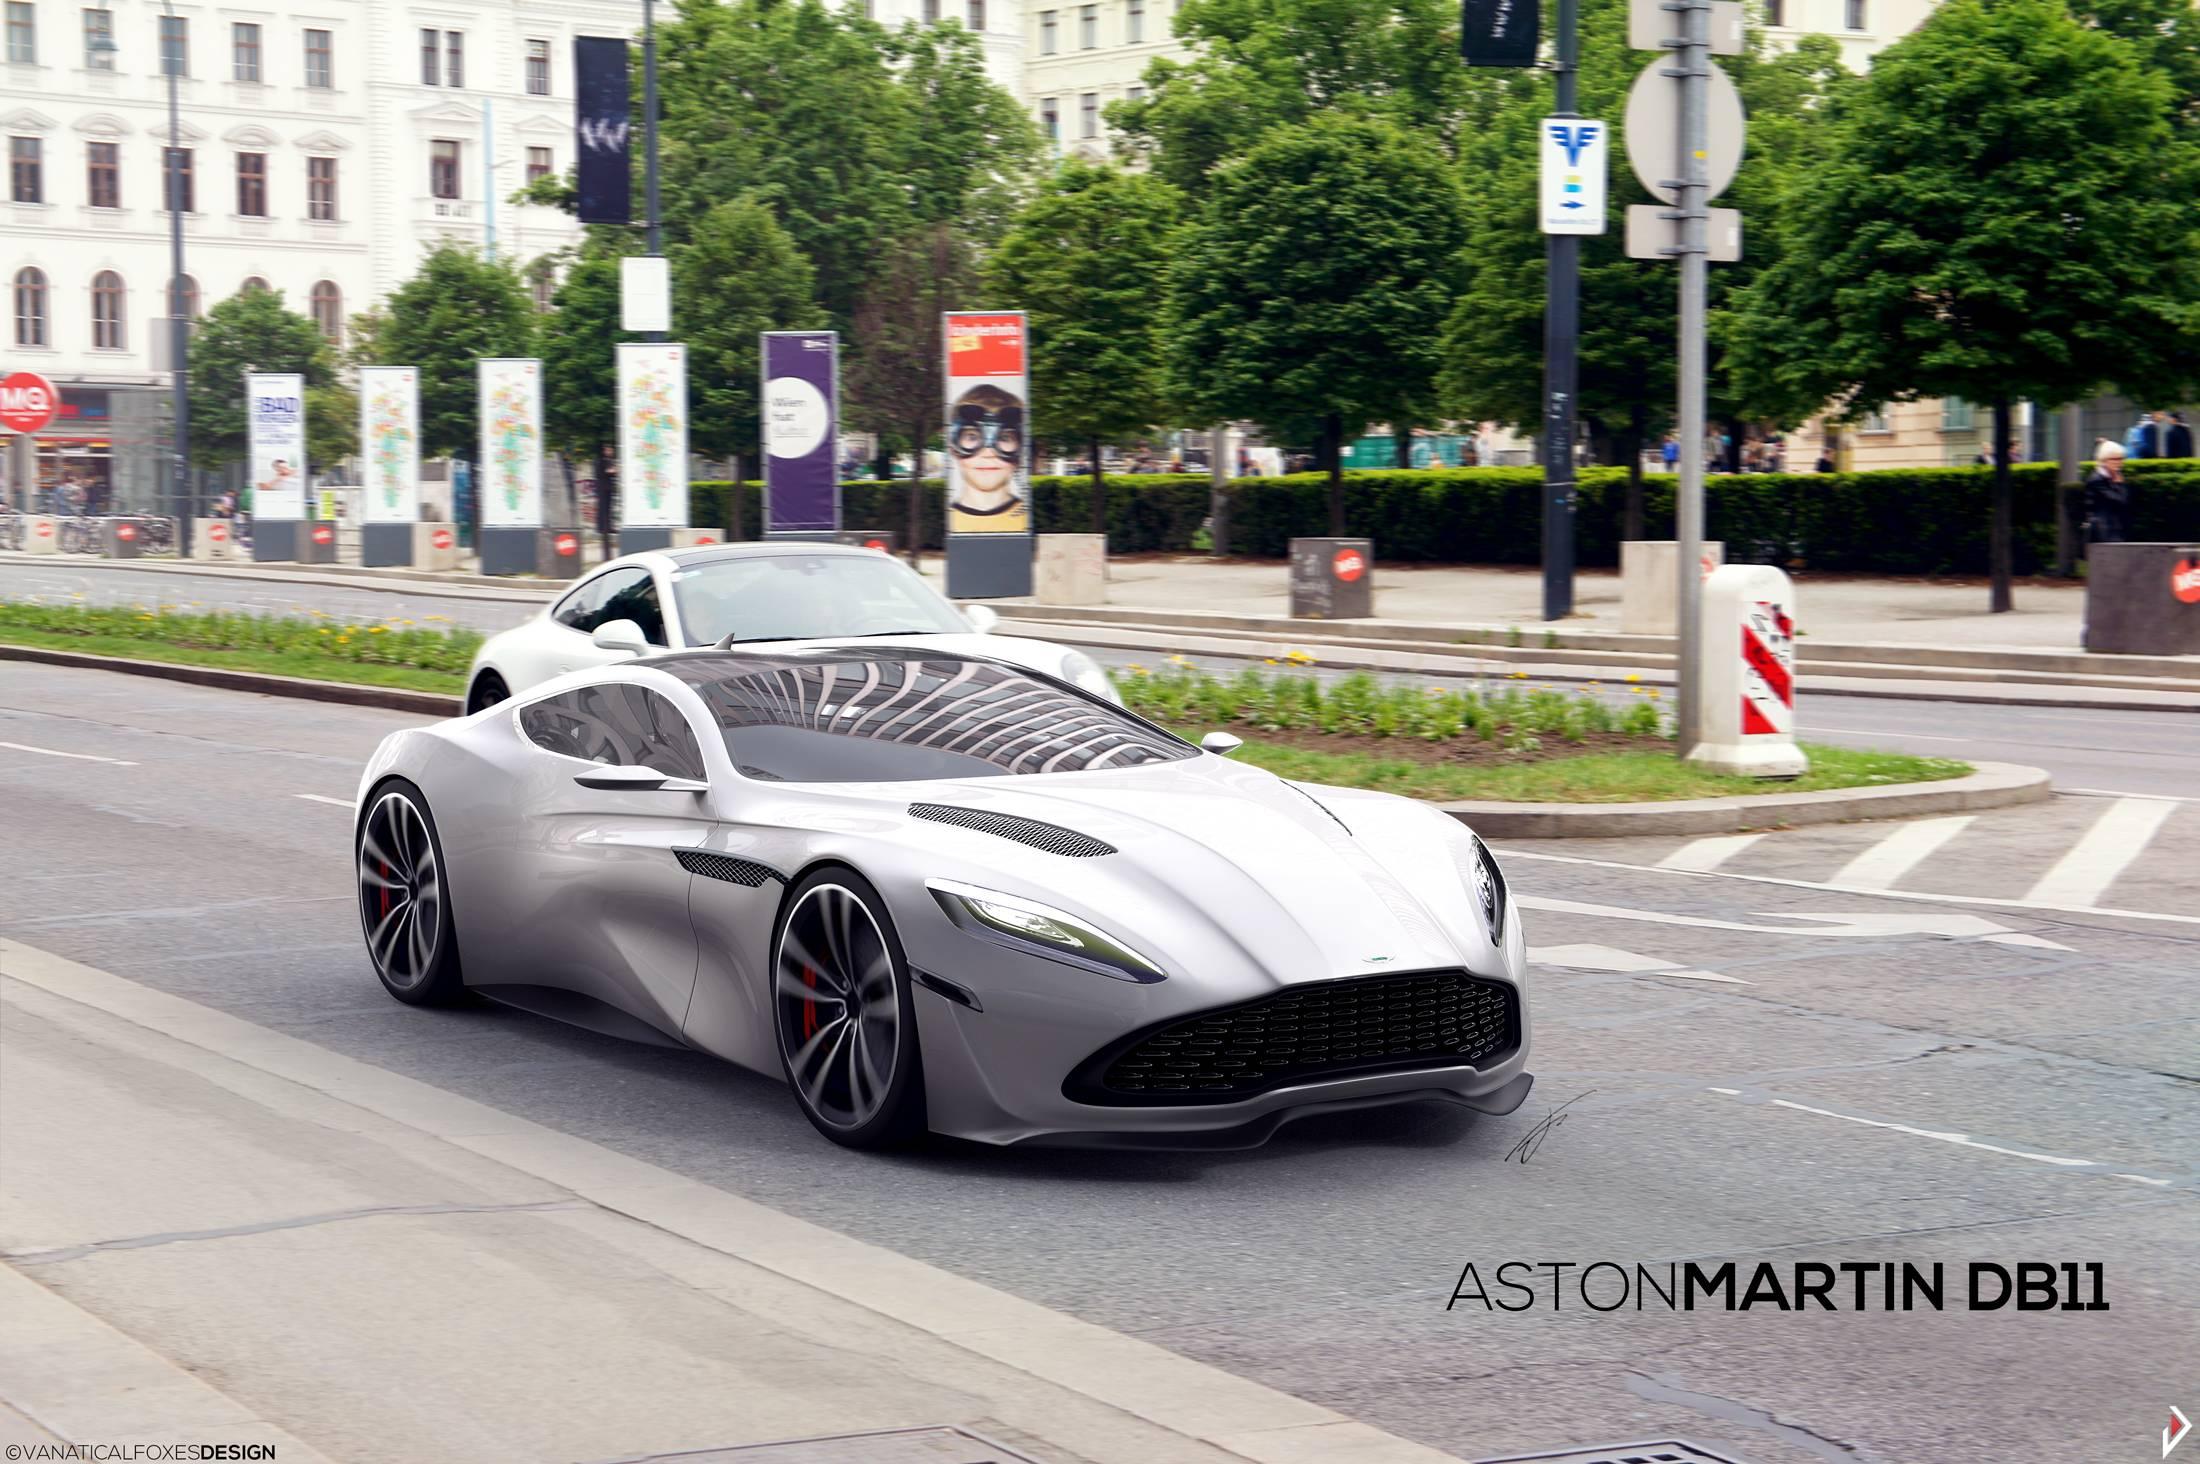 Aston Martin Db11 Mod 2200x1464 Download Hd Wallpaper Wallpapertip